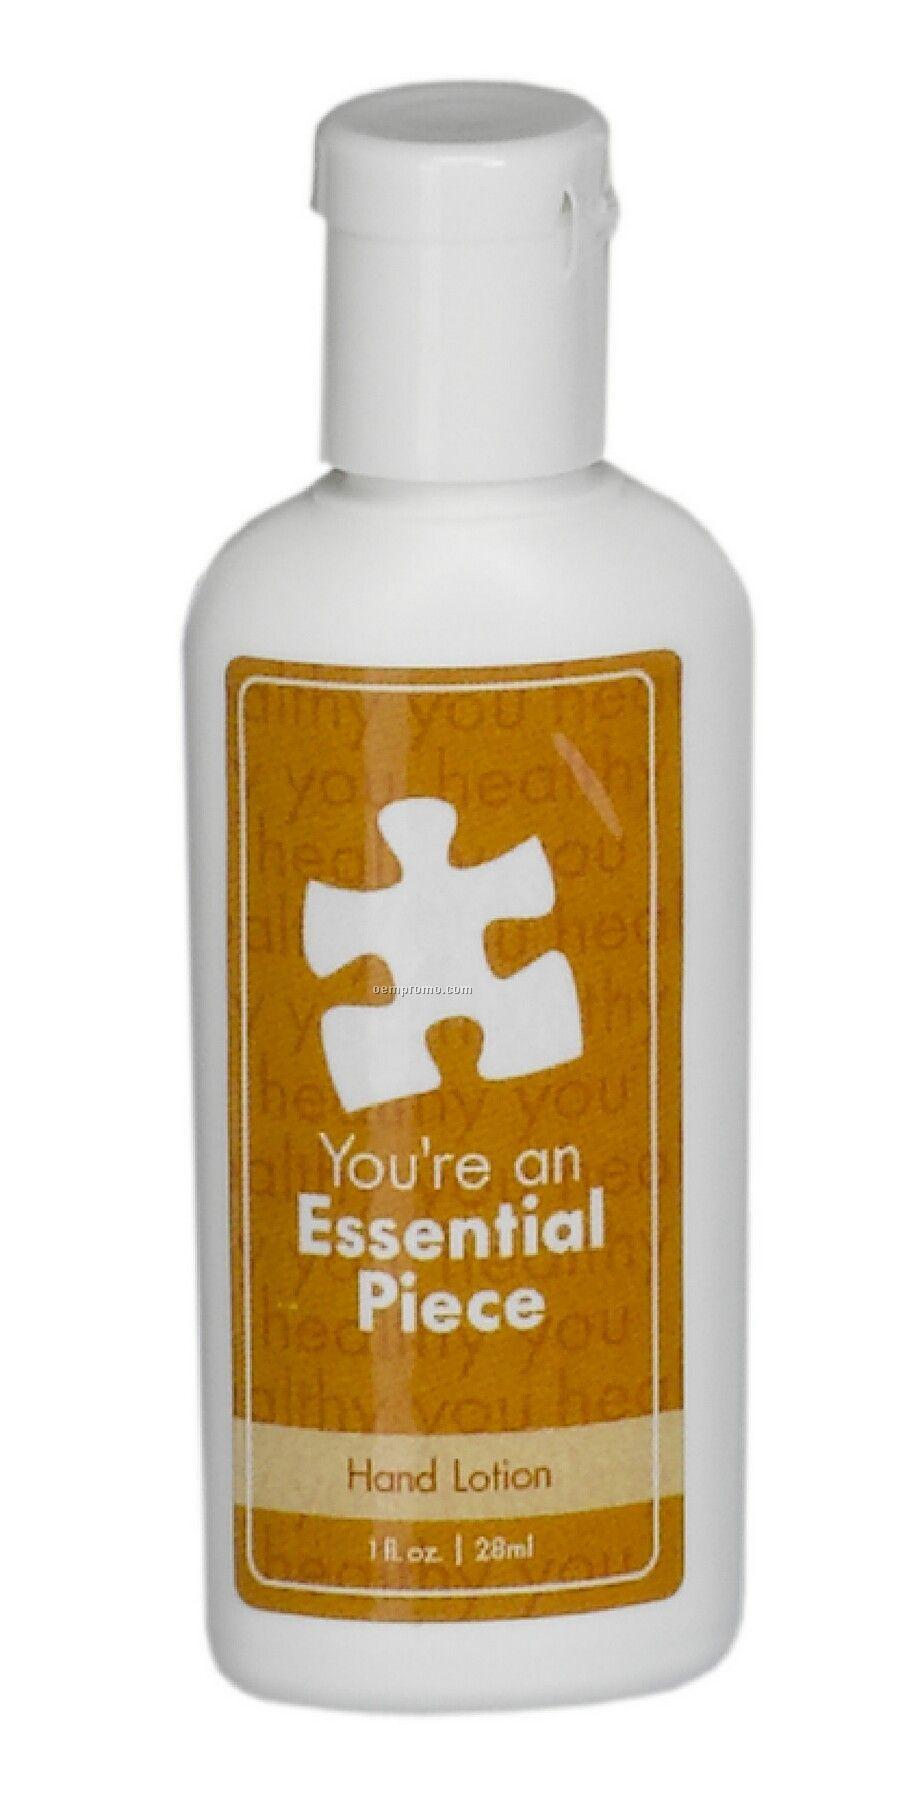 1 Oz. Spf 30 Sunscreen Lotion In Oval Bottle